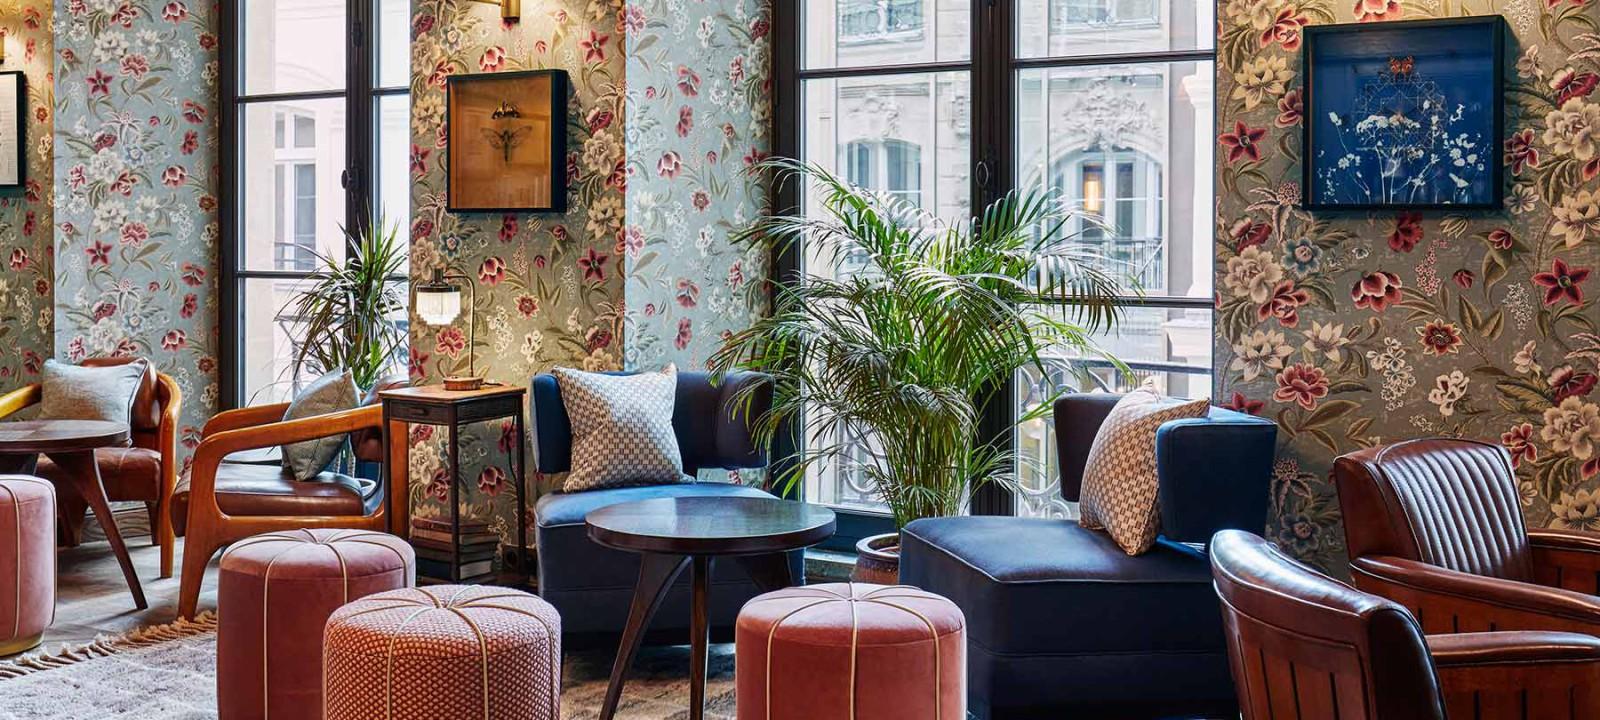 The Hoxton Hotel Paris